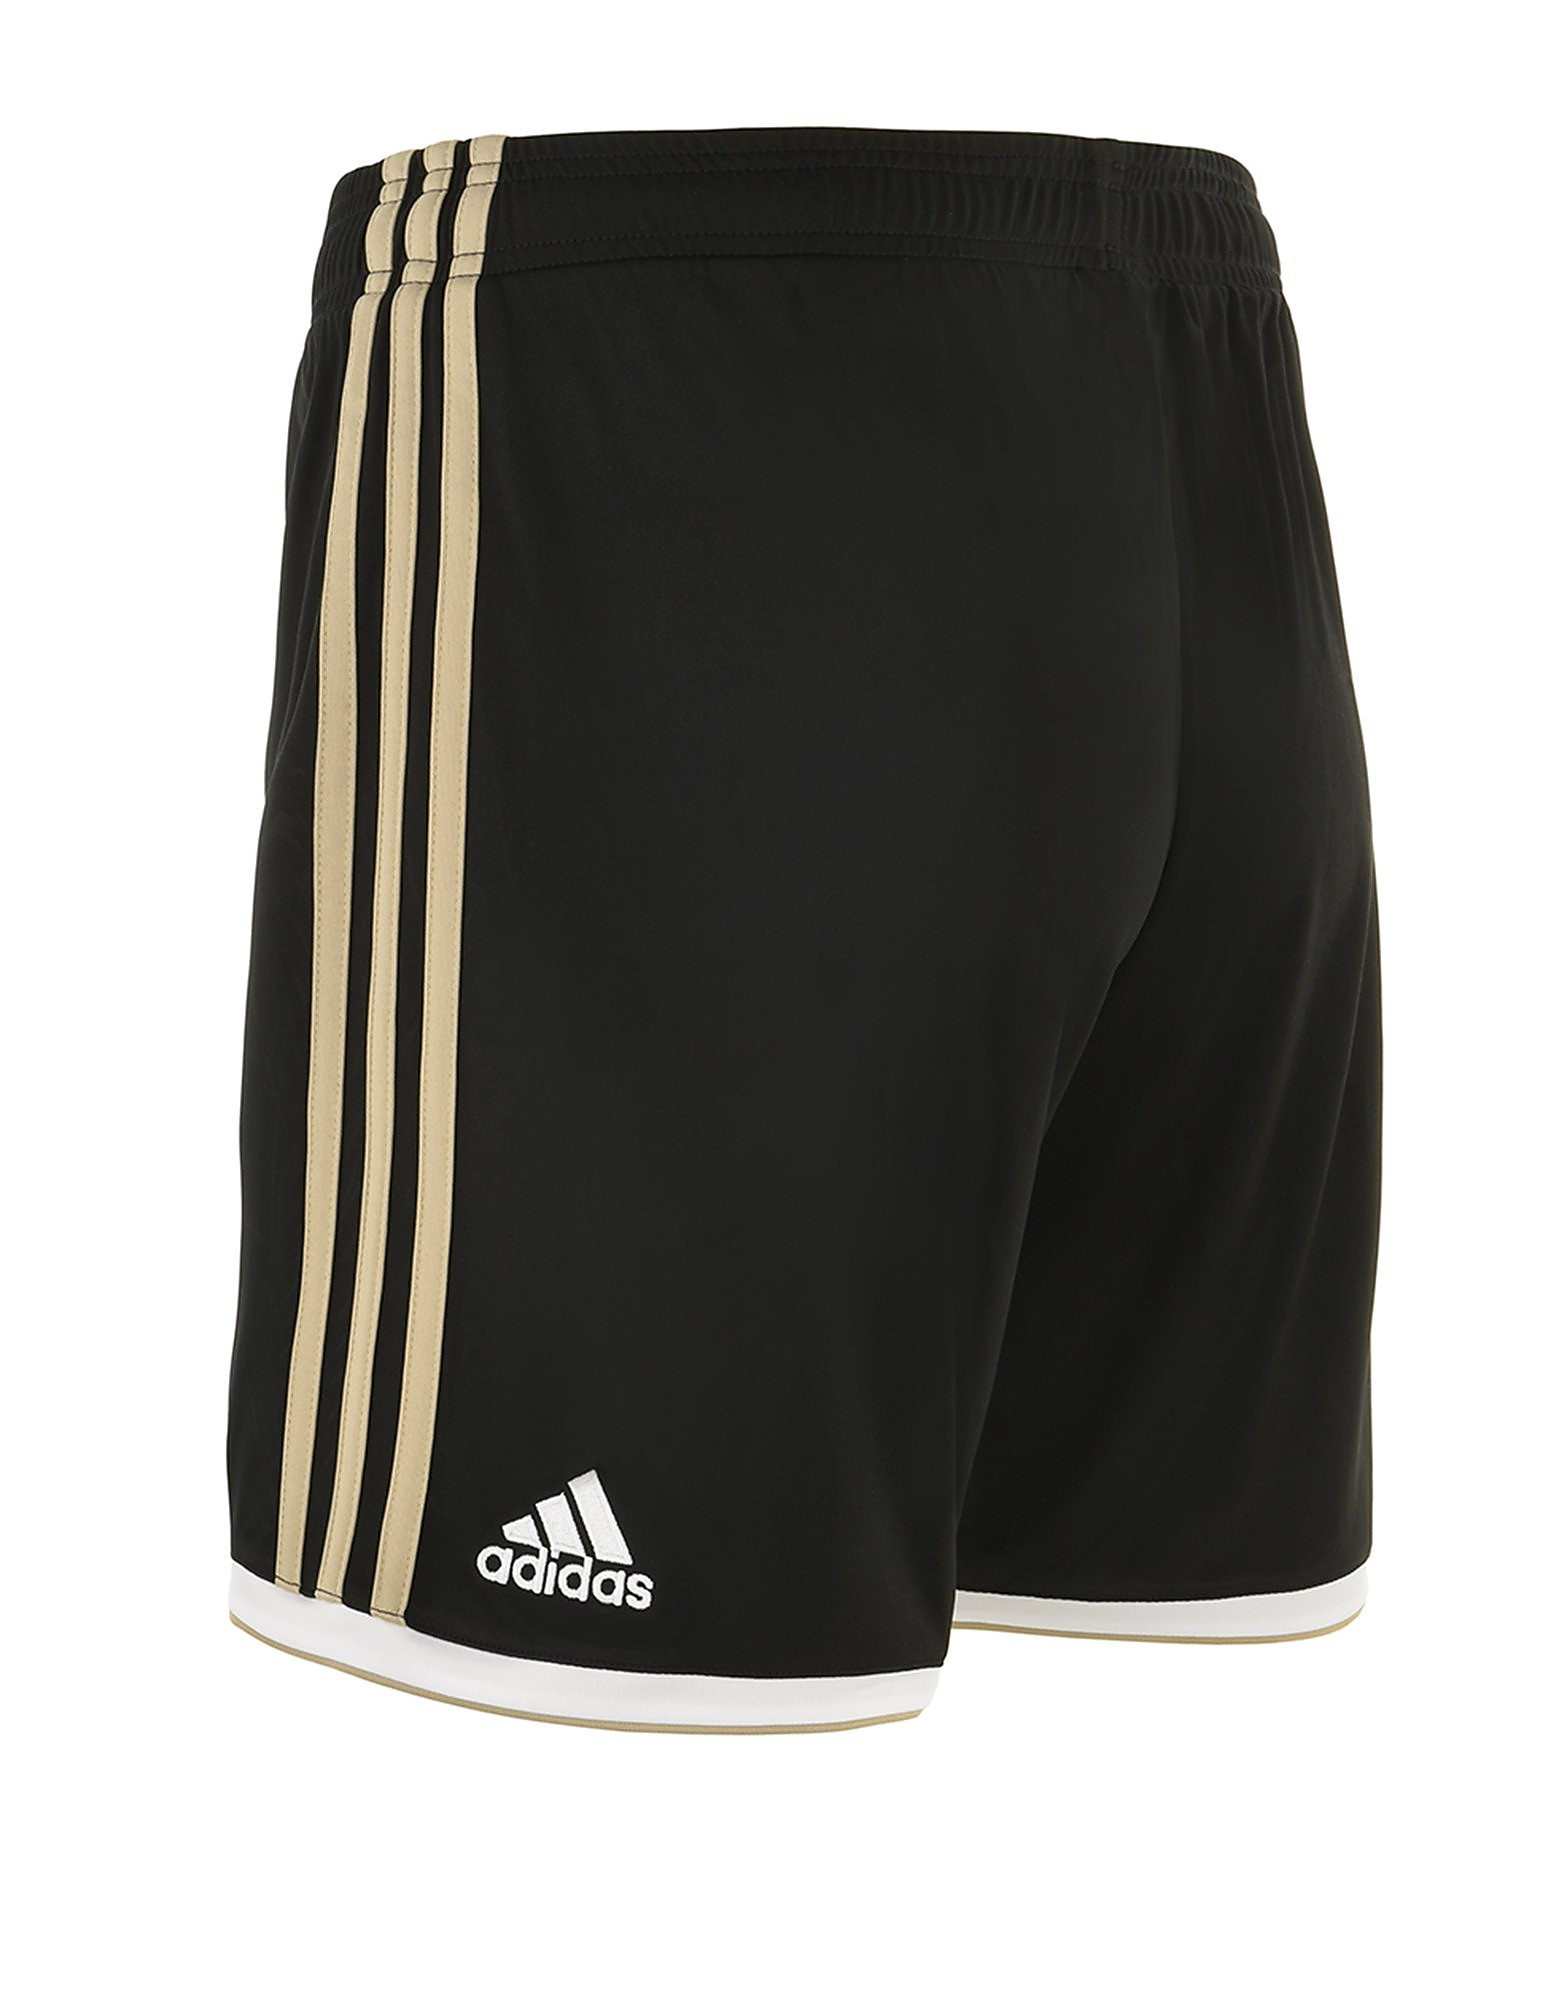 adidas Ajax 2018/19 Away Shorts Junior